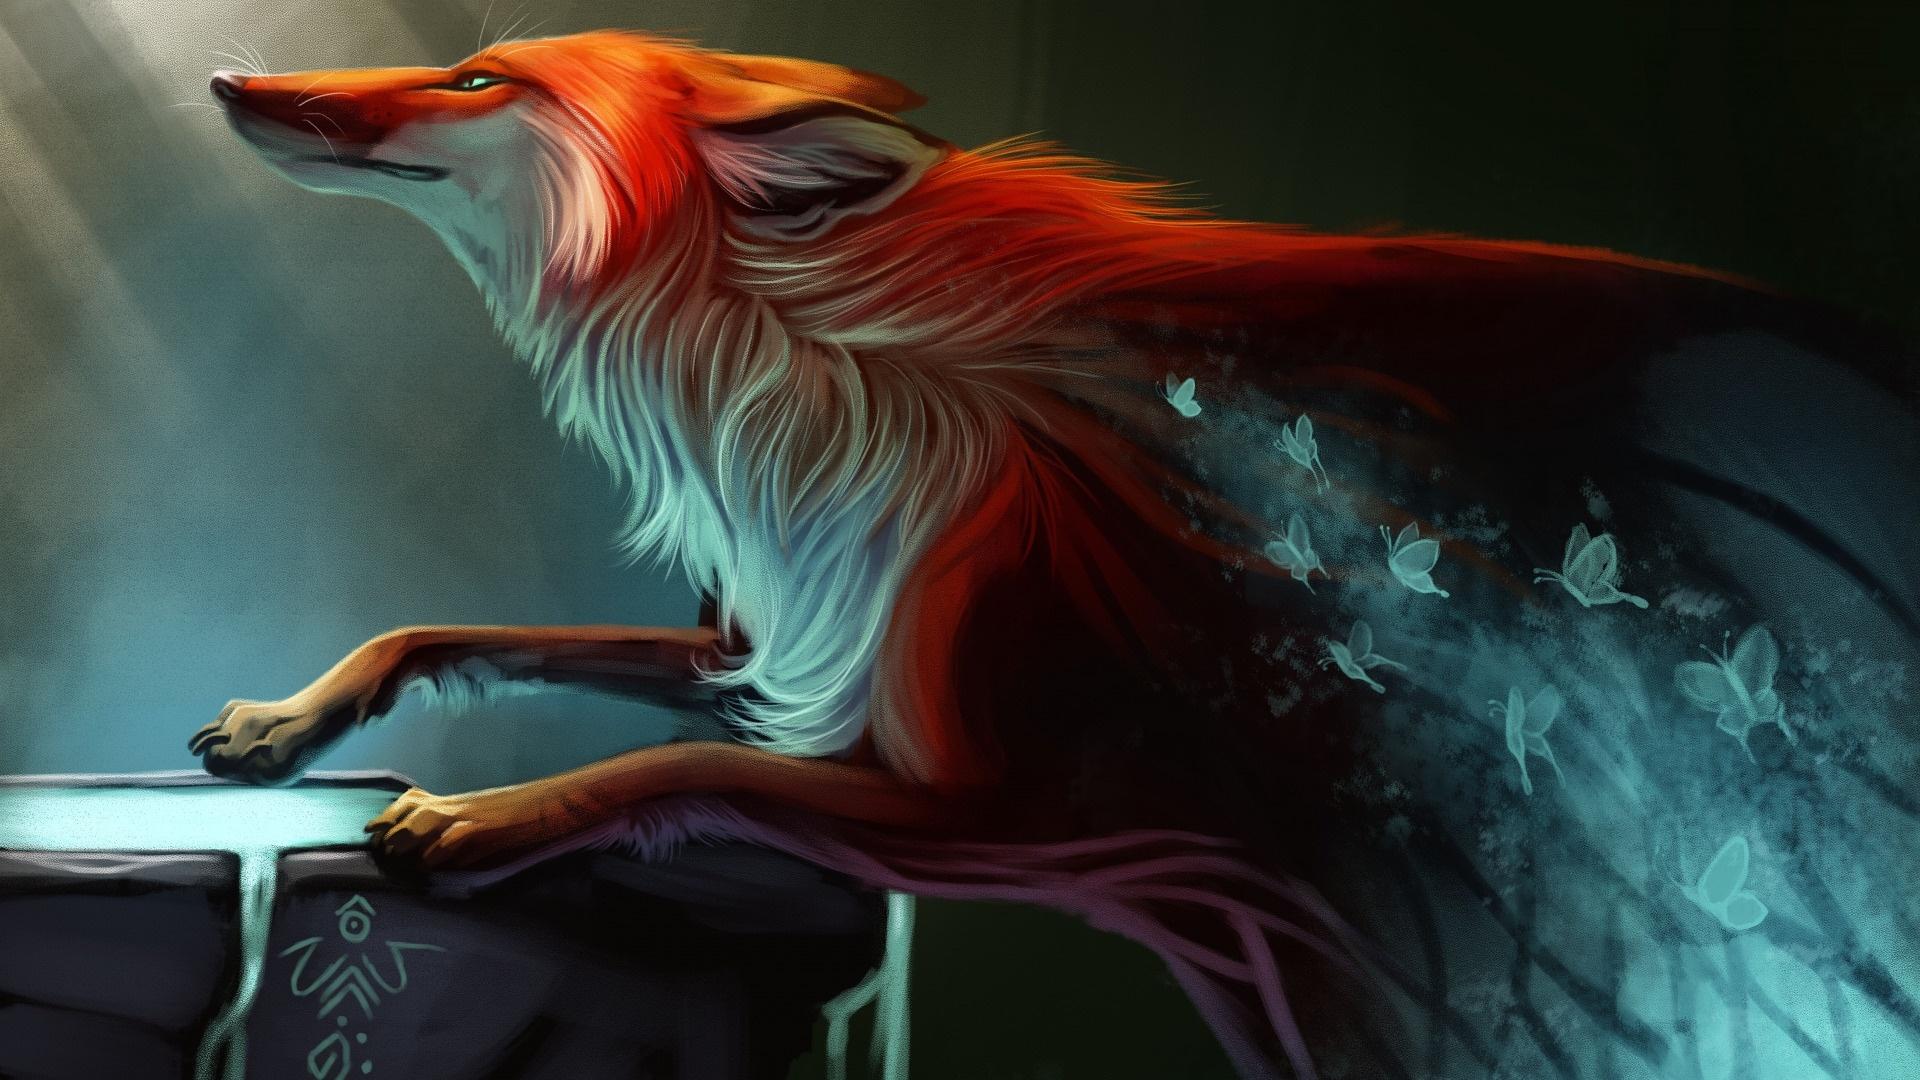 Fox Art Image